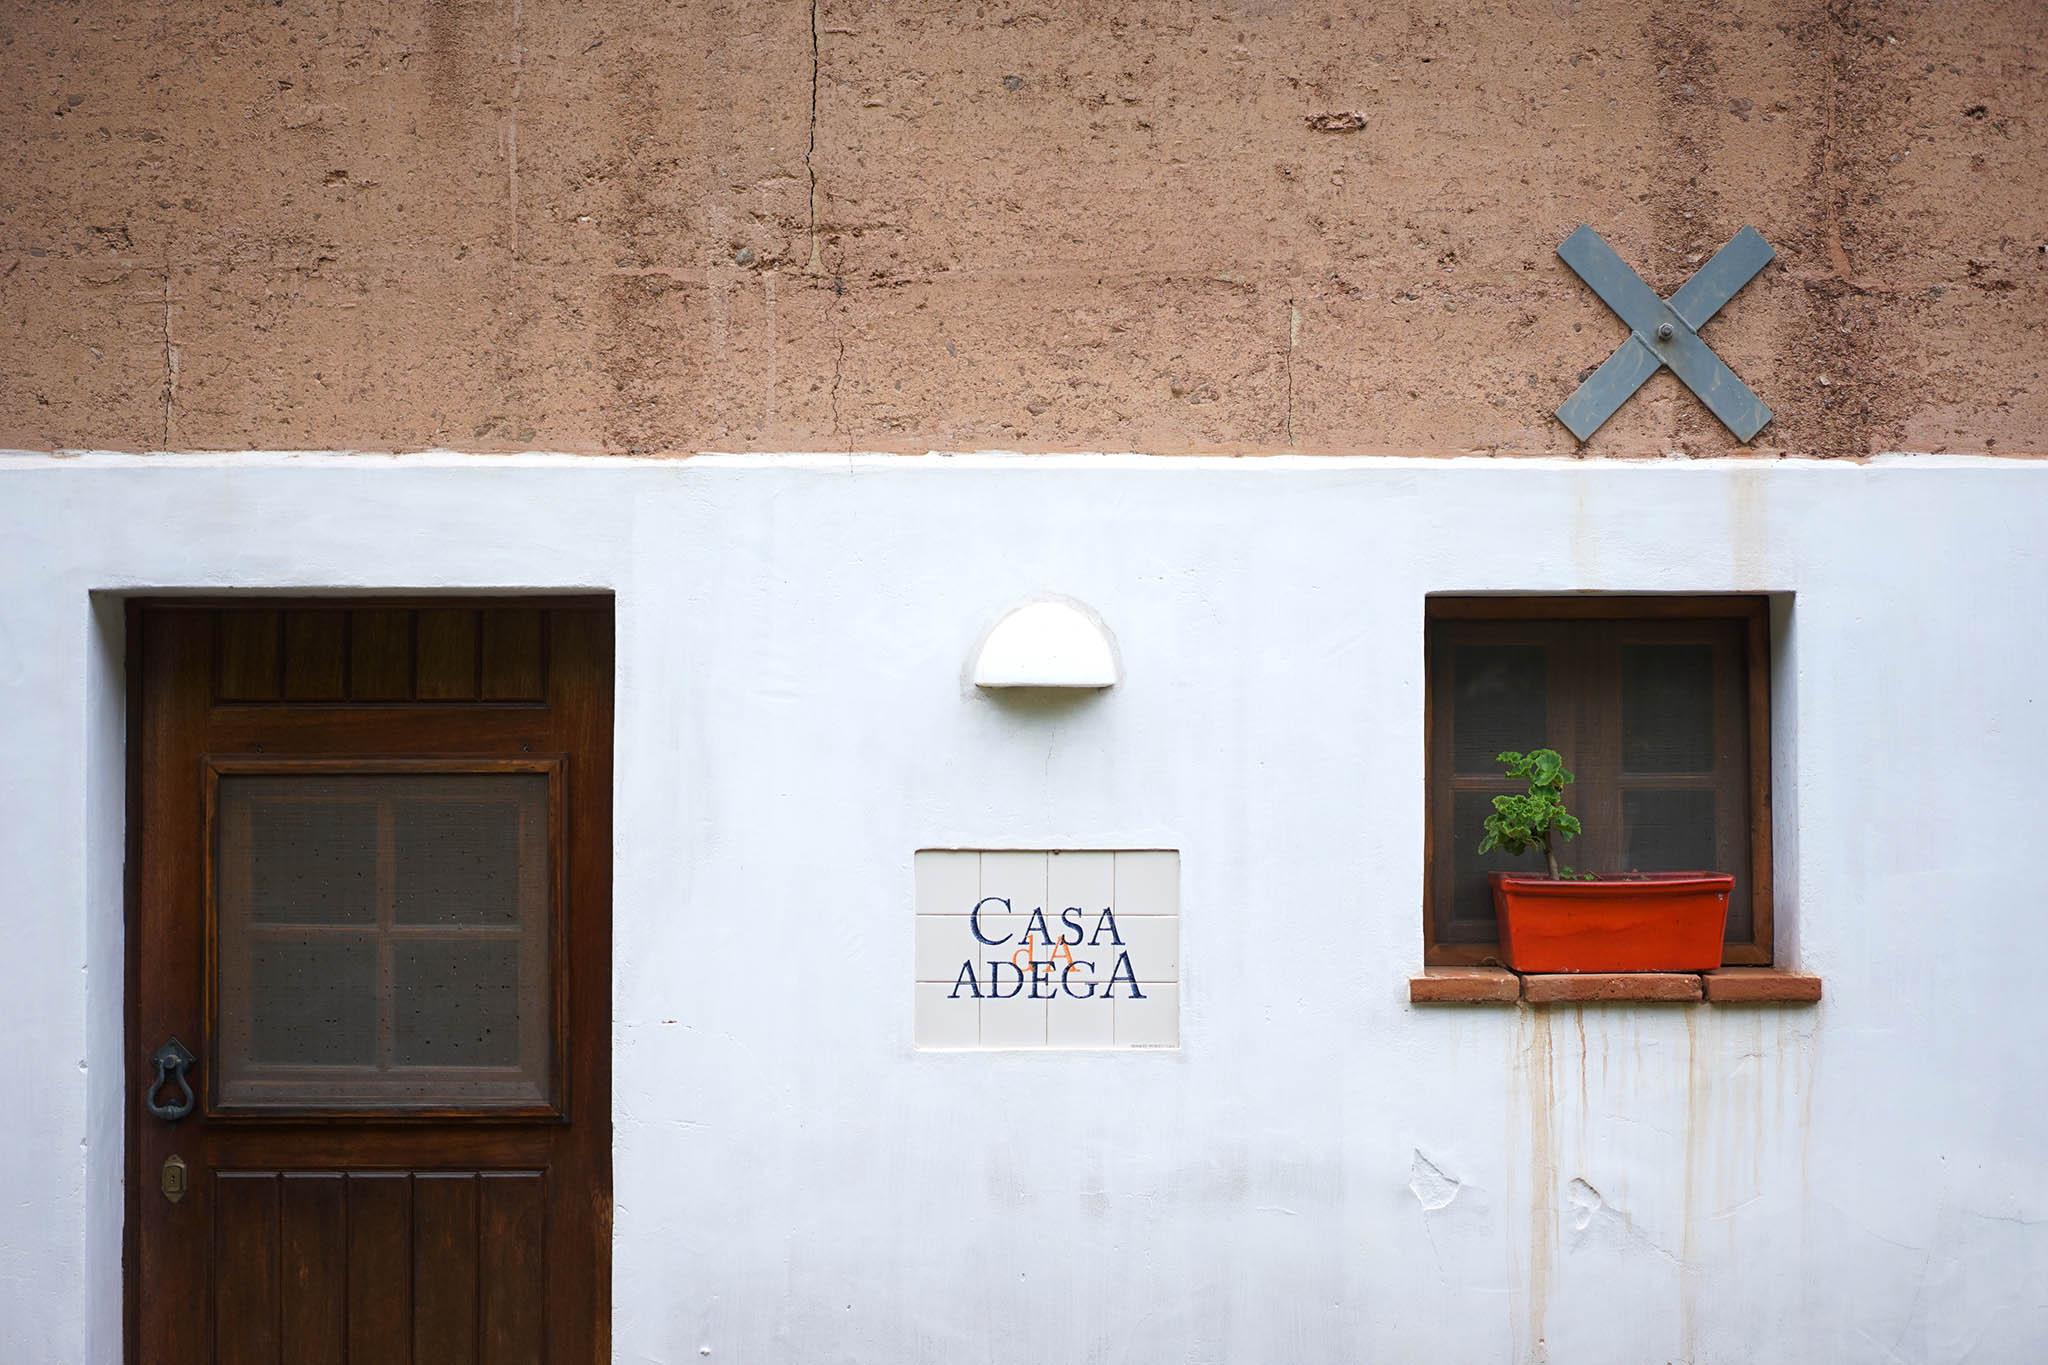 2017-04-Casas-da-Cerca-Portugal - casas-da-cerca-portugal-nectarandpulse-architecture-30.jpg